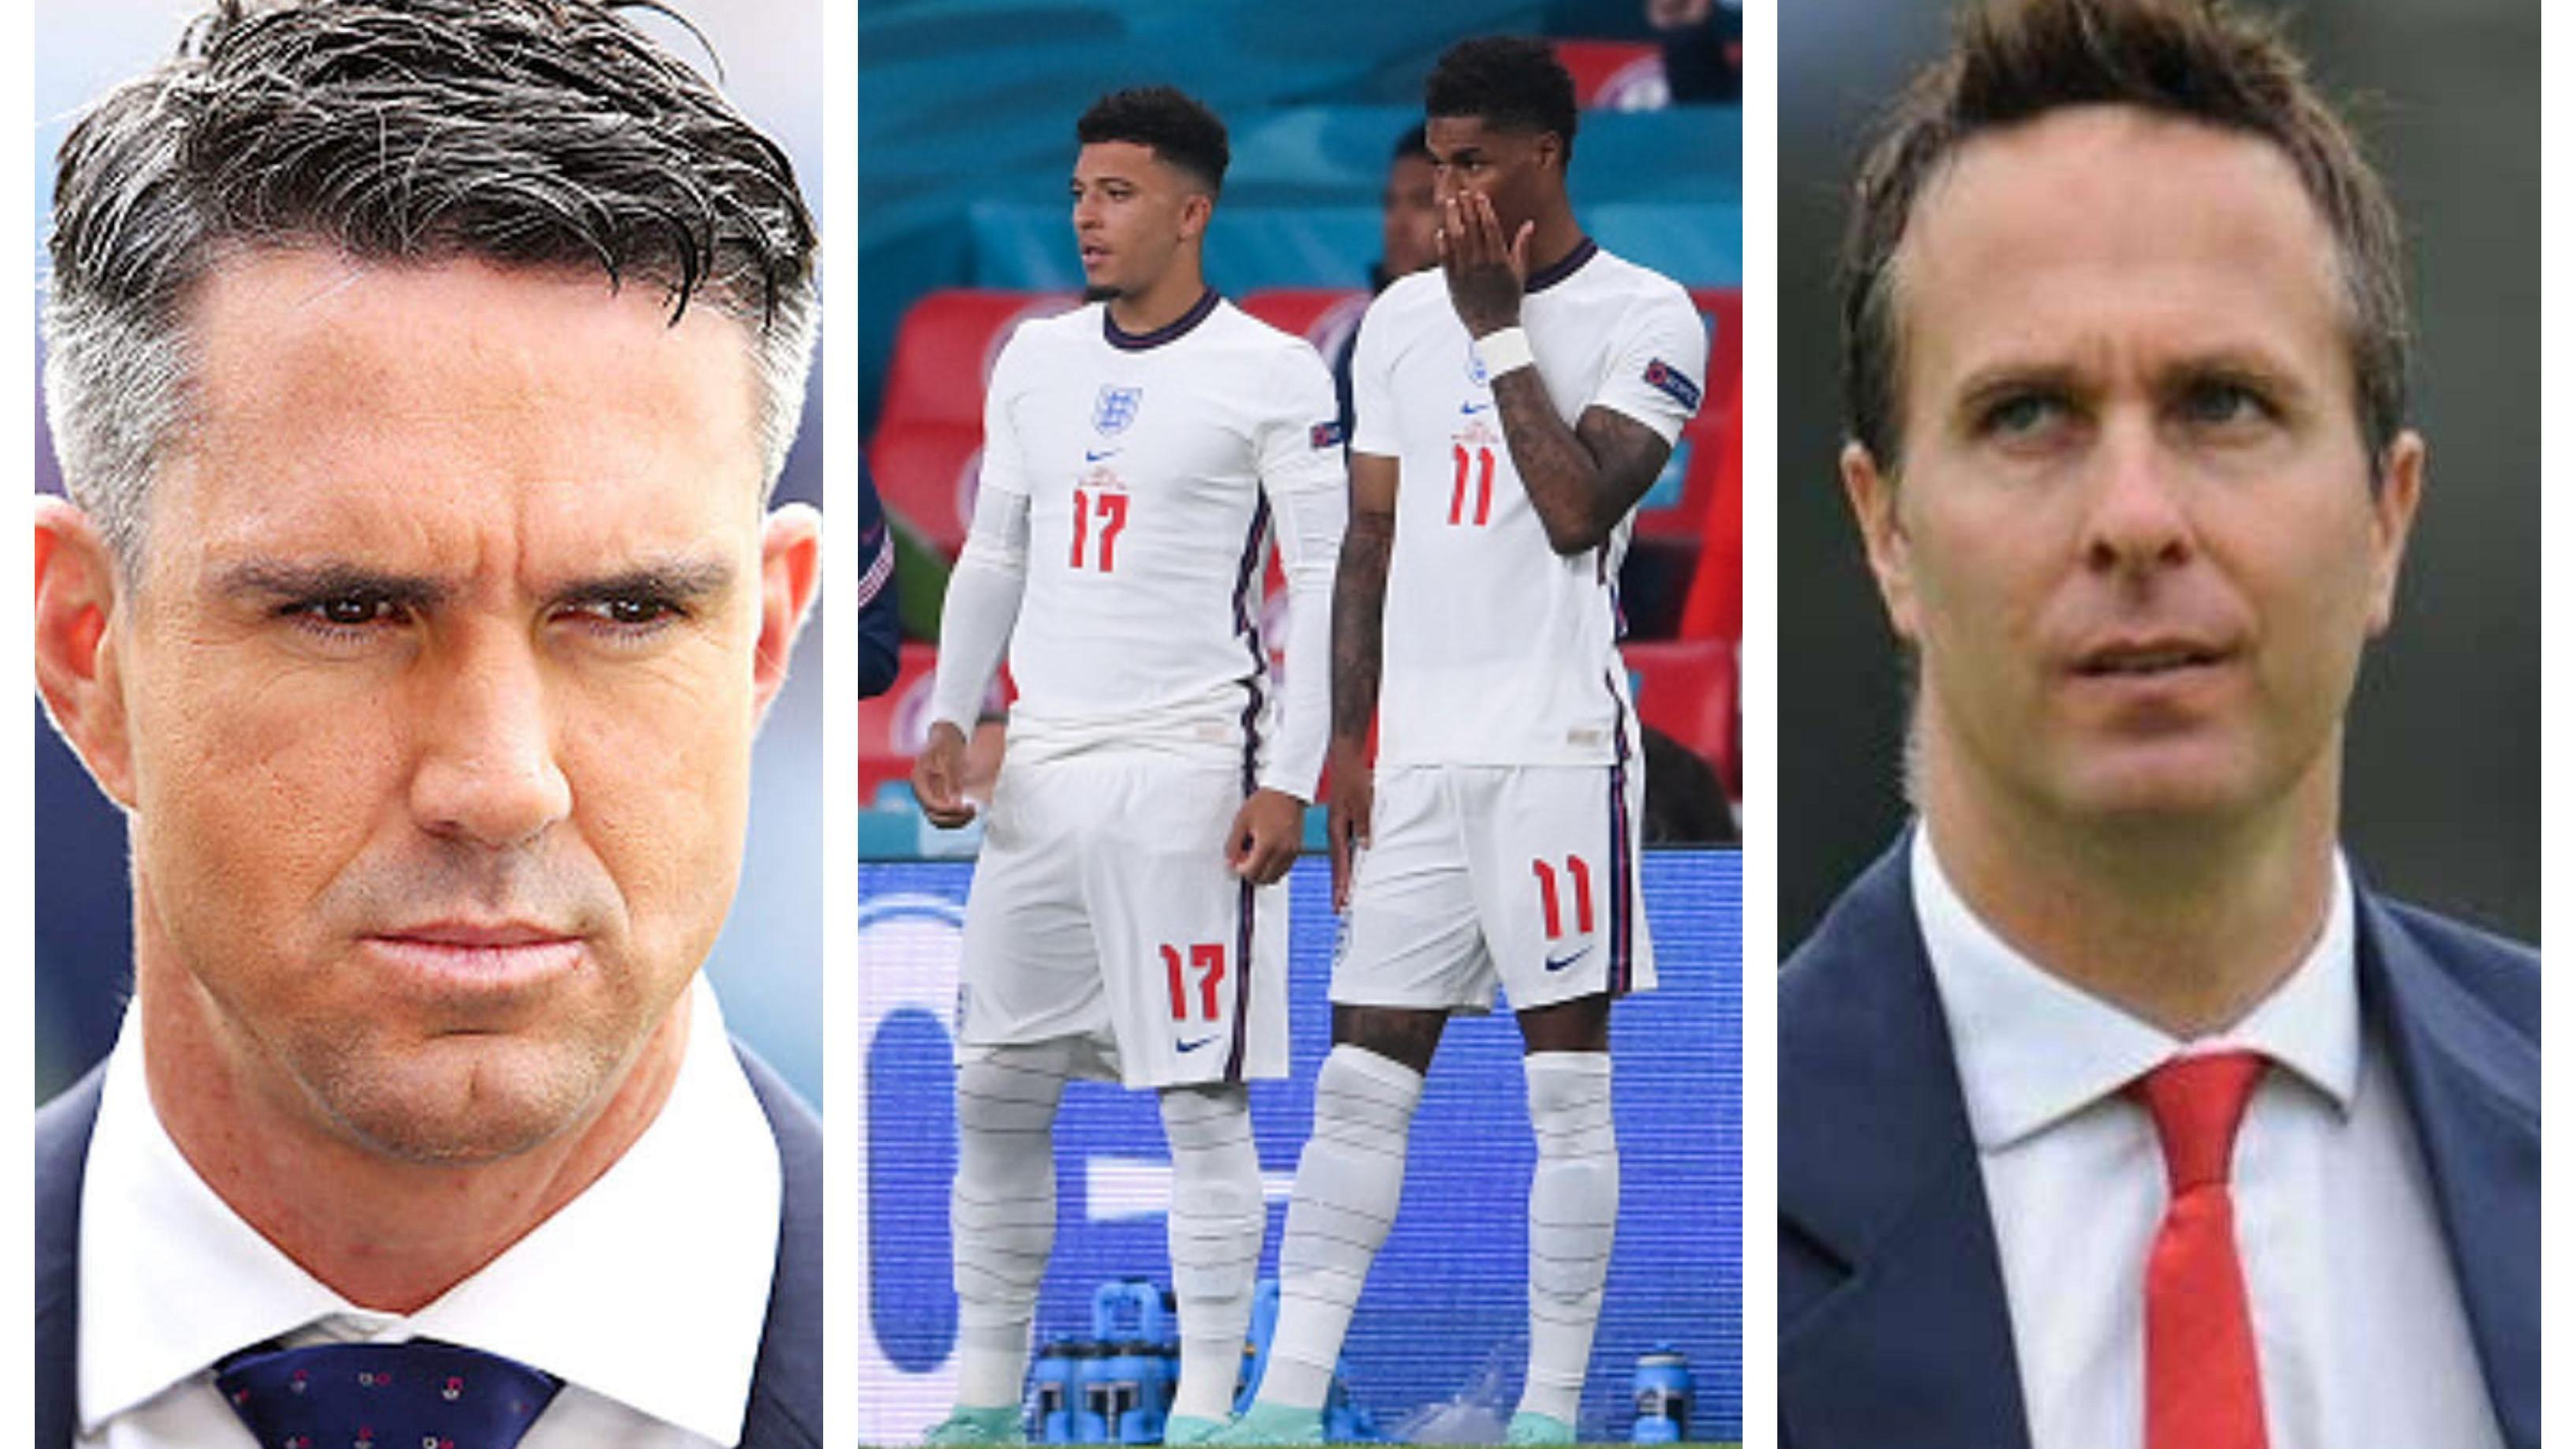 Pietersen, Vaughan condemn racial abuse of Black English footballers after Euro 2020 final loss